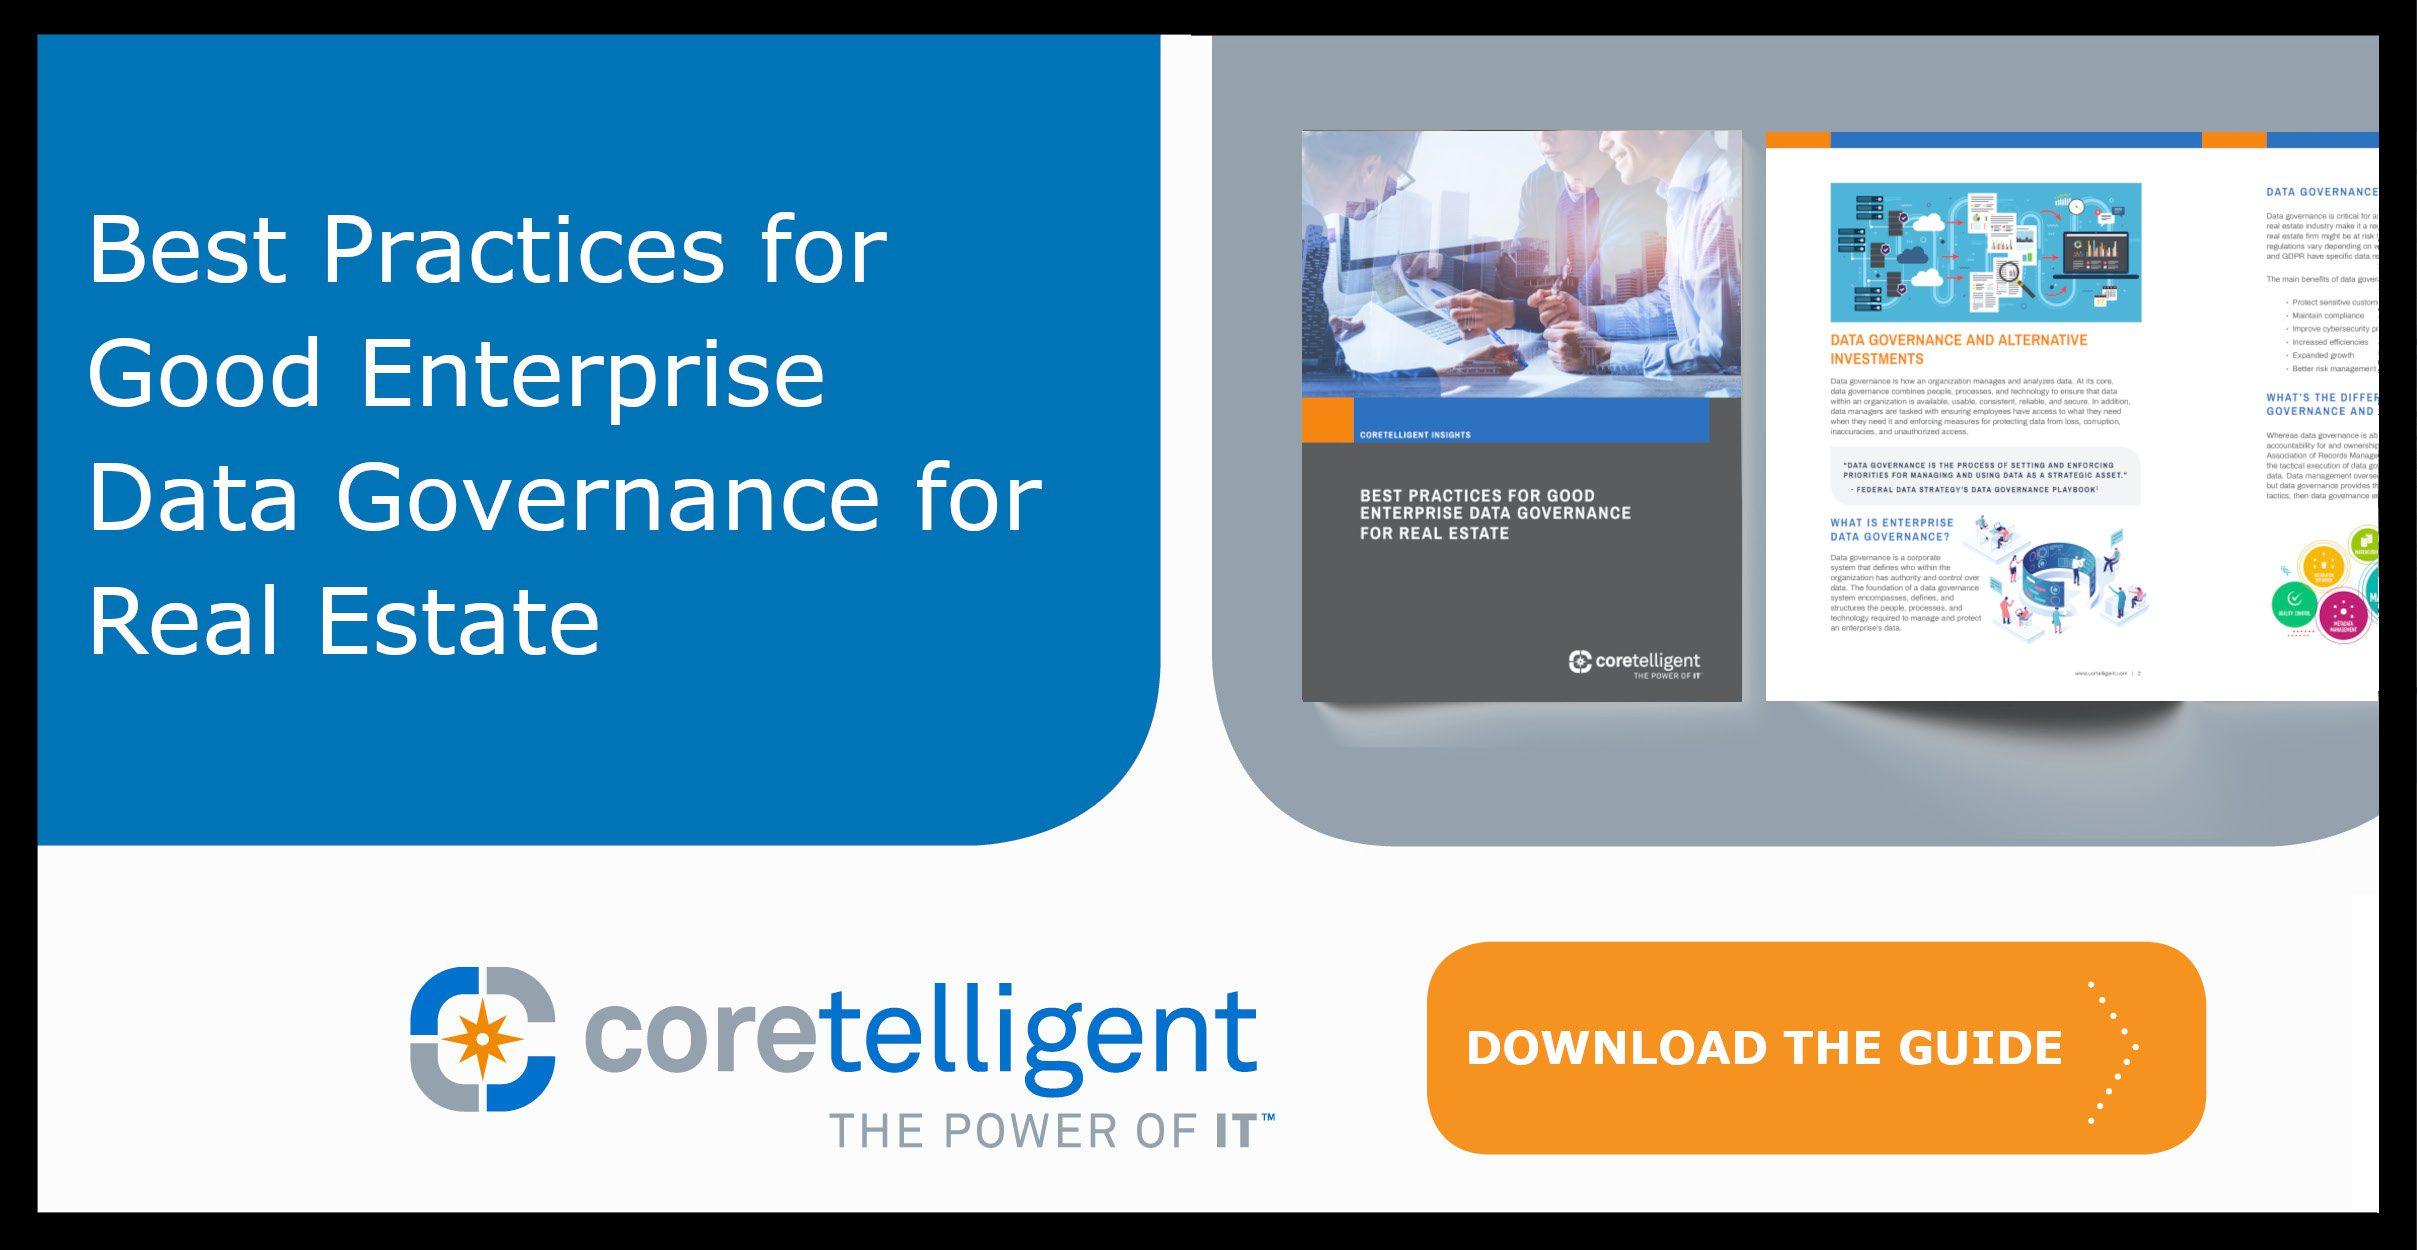 Best Practices for Good Enterprise Data Governance for Real Estate